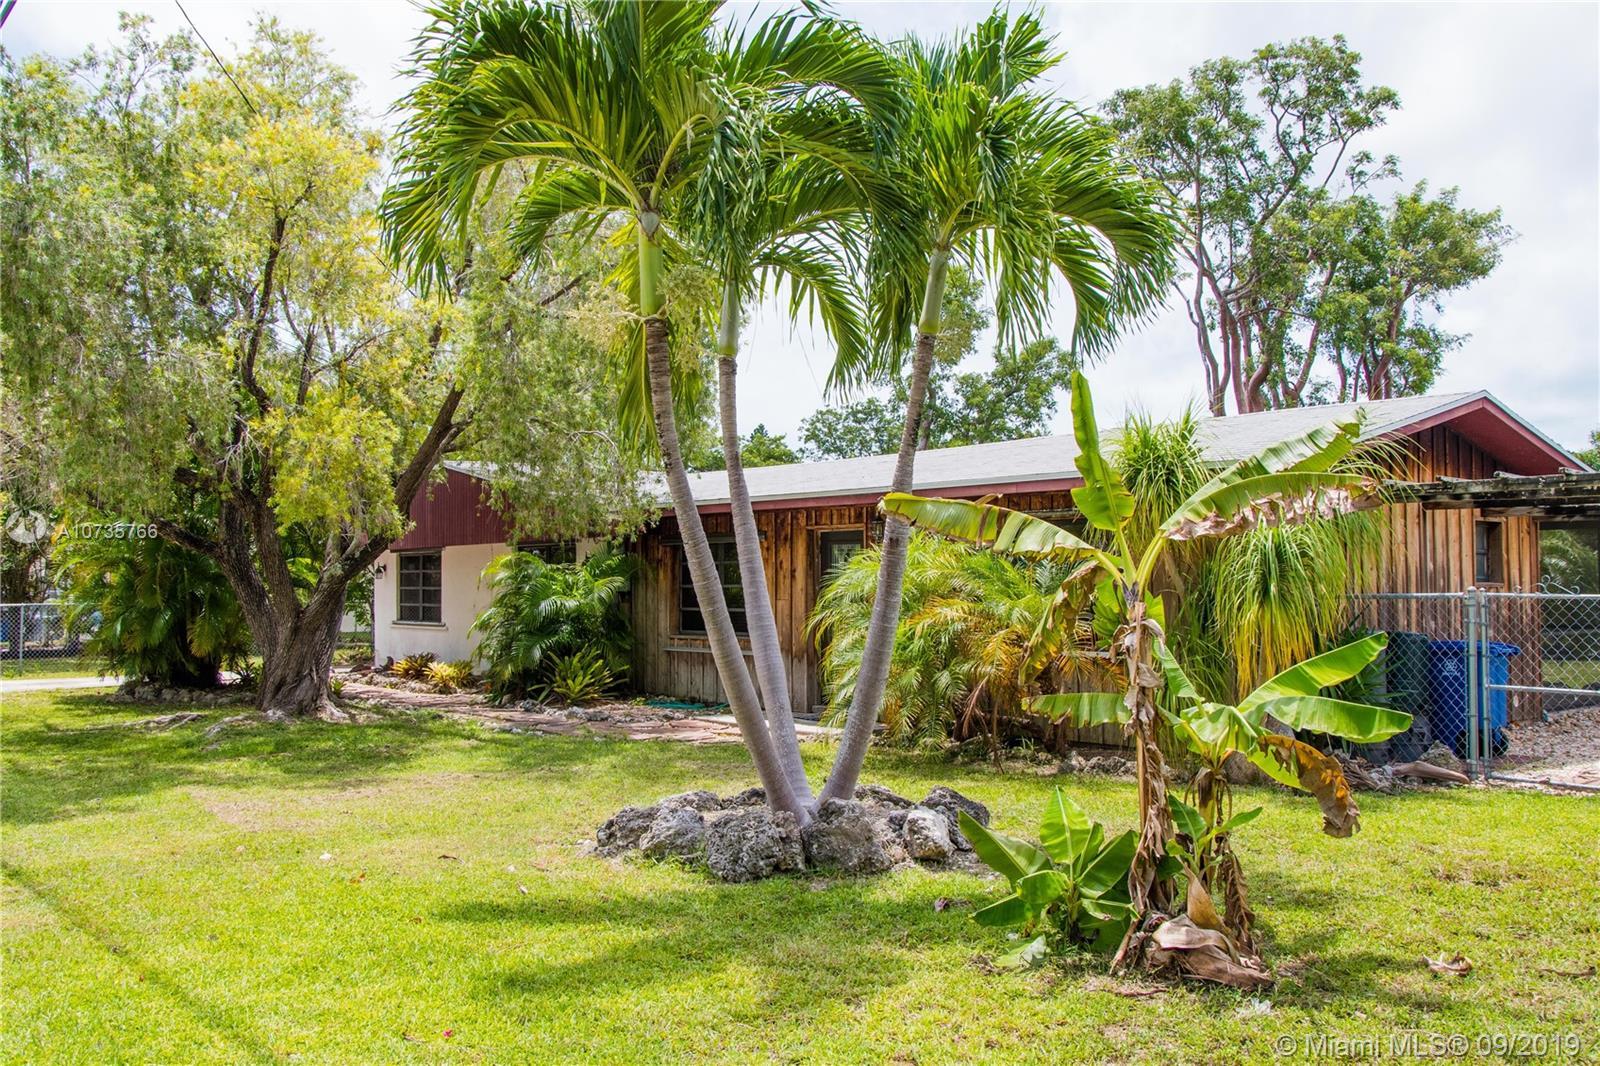 532 Plante, Other City - Keys/Islands/Caribb, FL 33037 - Other City - Keys/Islands/Caribb, FL real estate listing